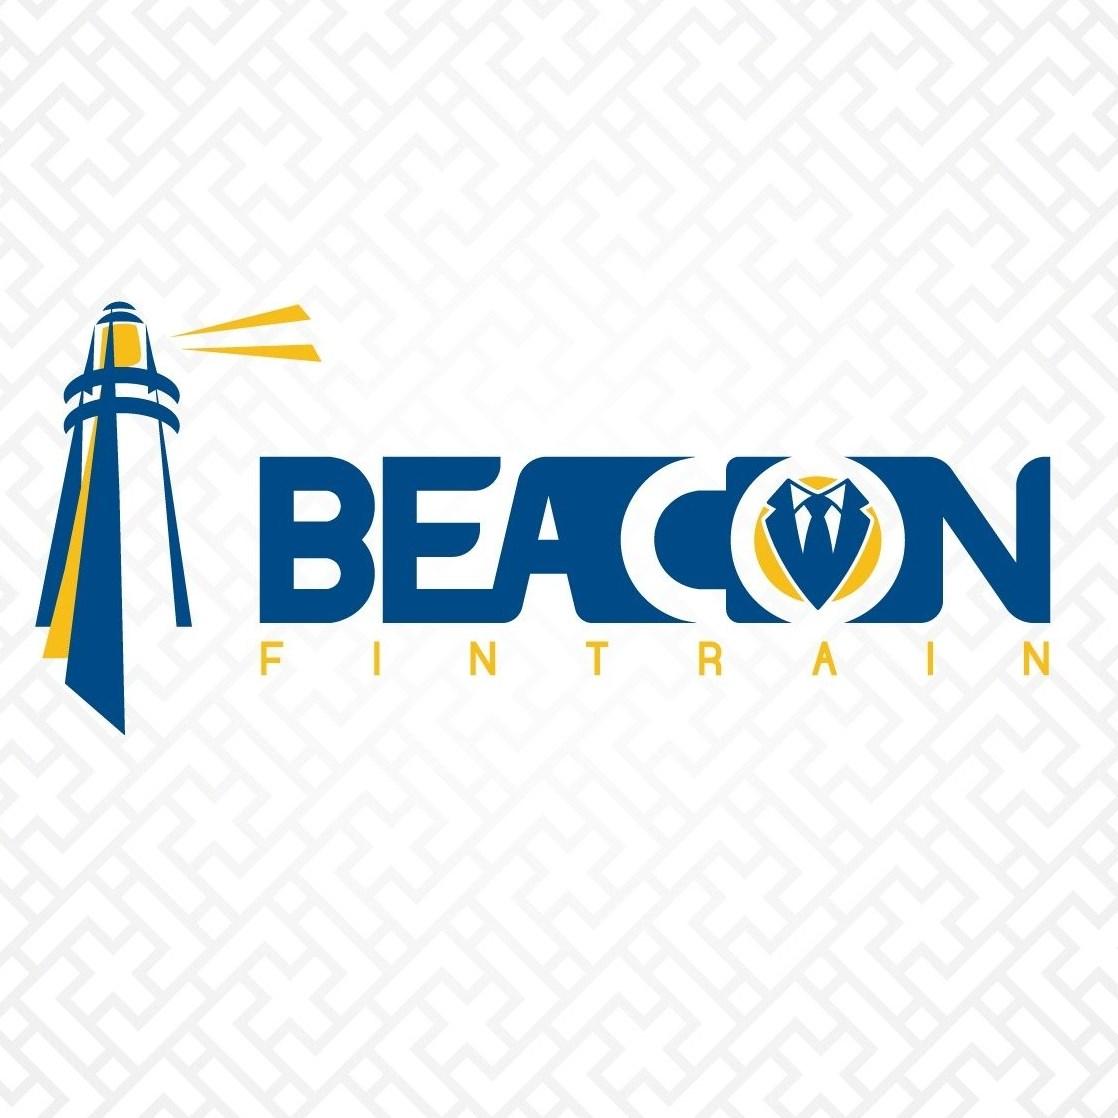 Beacon FinTrain